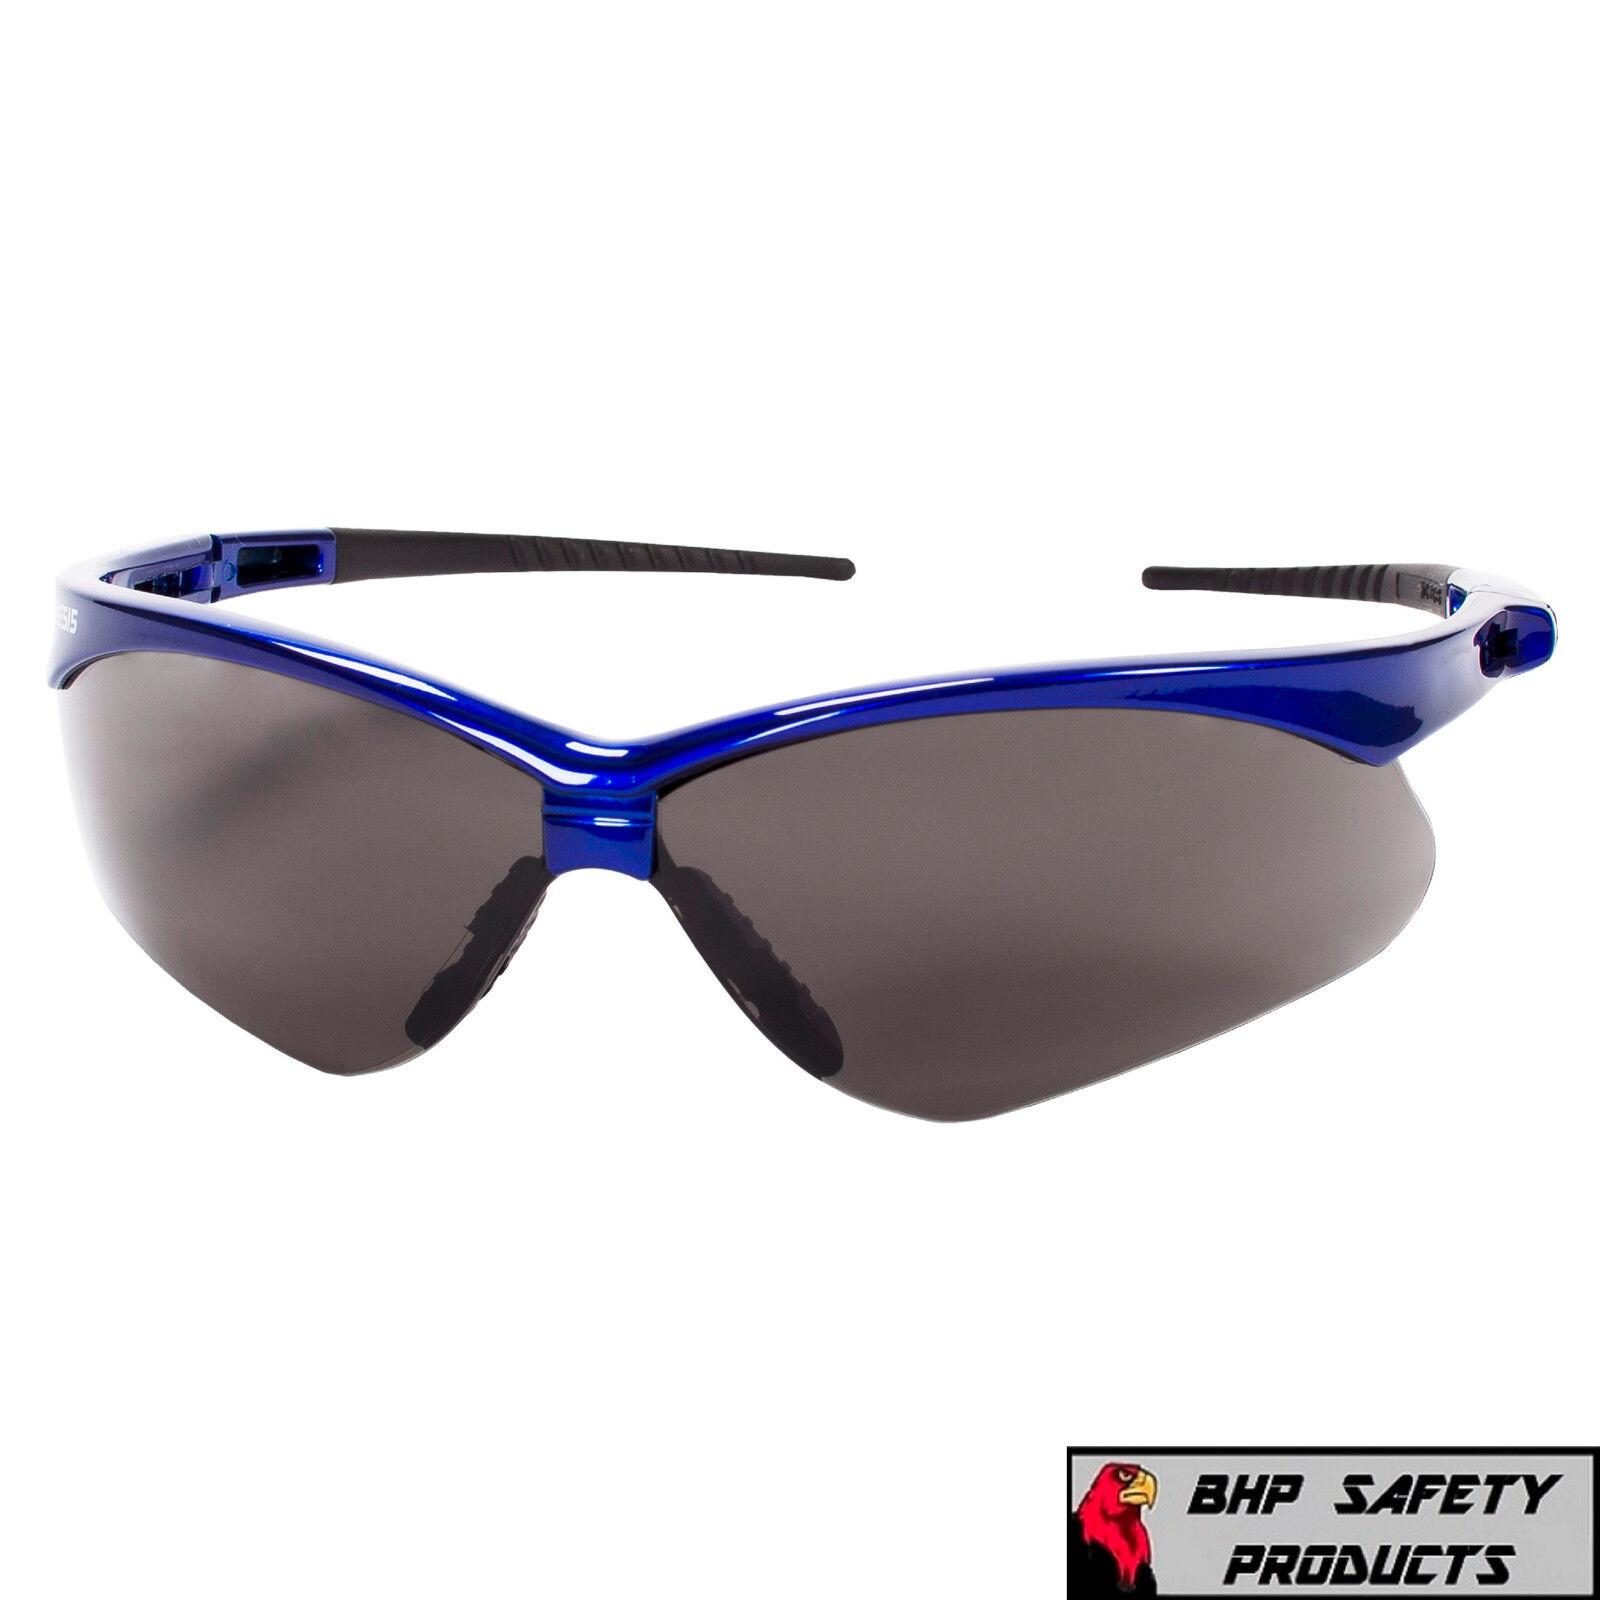 JACKSON NEMESIS SAFETY GLASSES SUNGLASSES SPORT WORK EYEWEAR - VARIETY PACKS 47387- Blue Frame/Smoke AF Lens